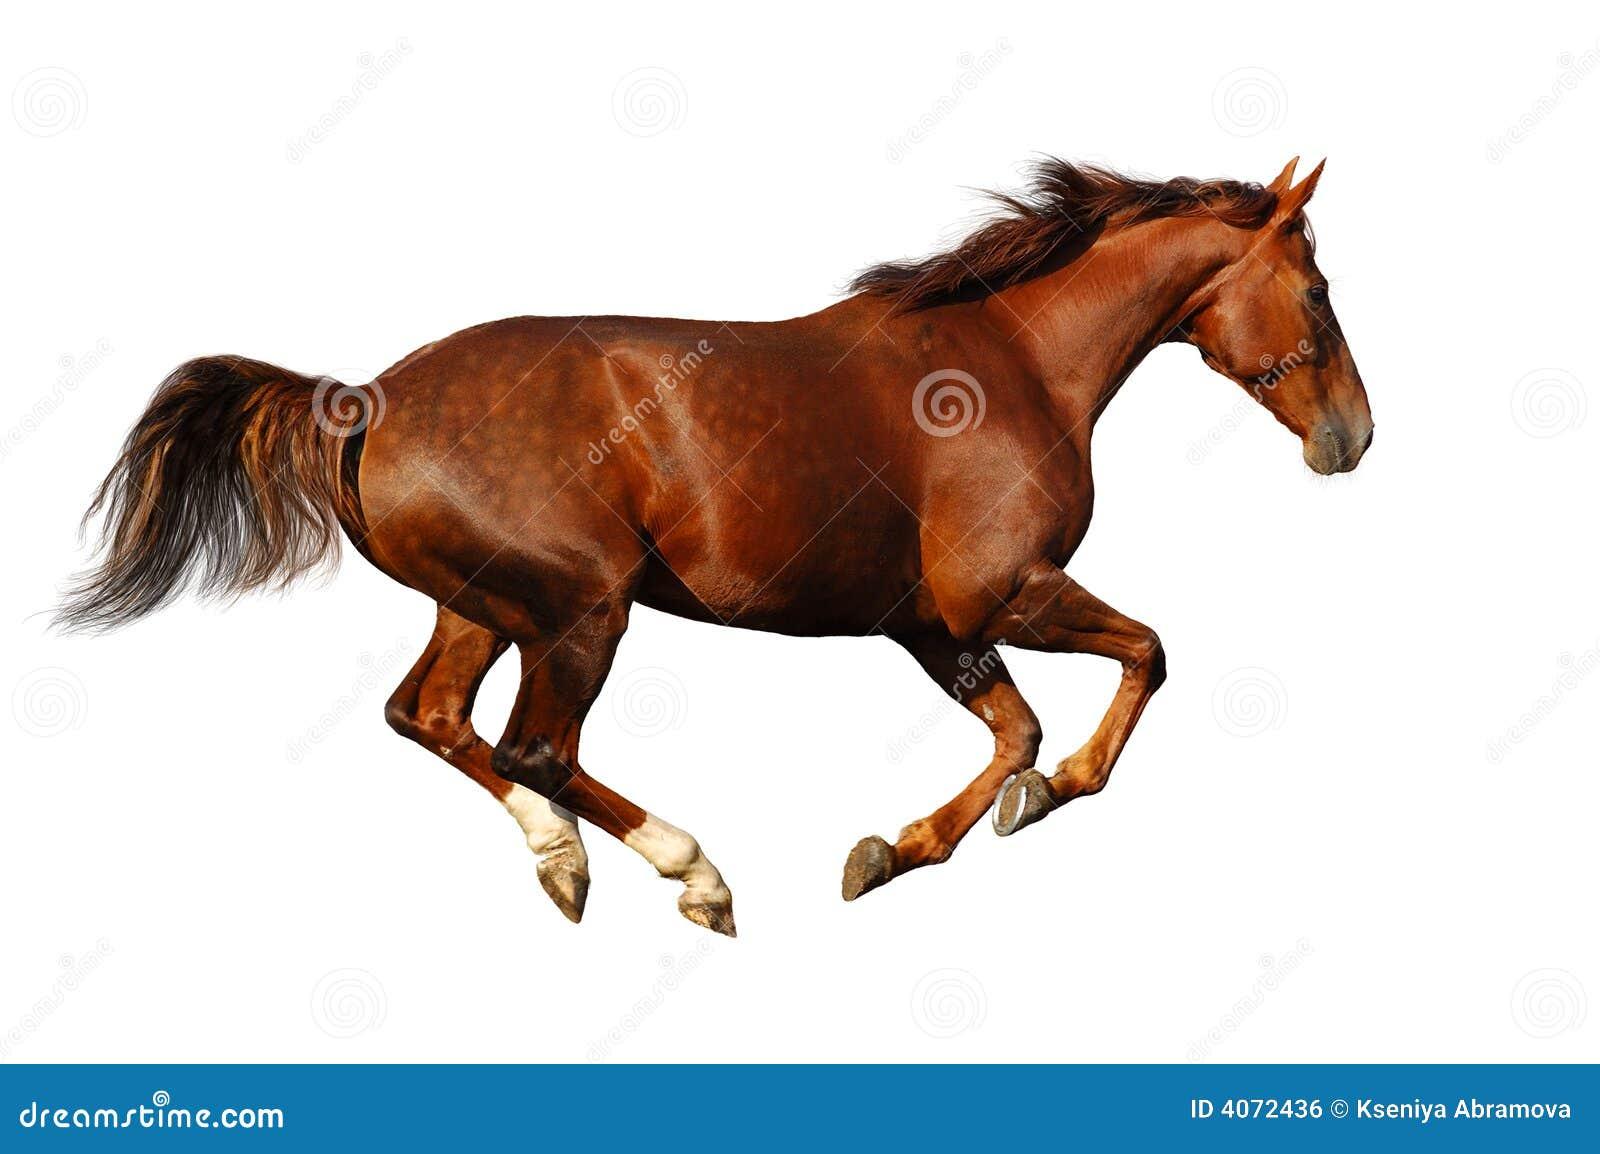 Budenny horse gallops